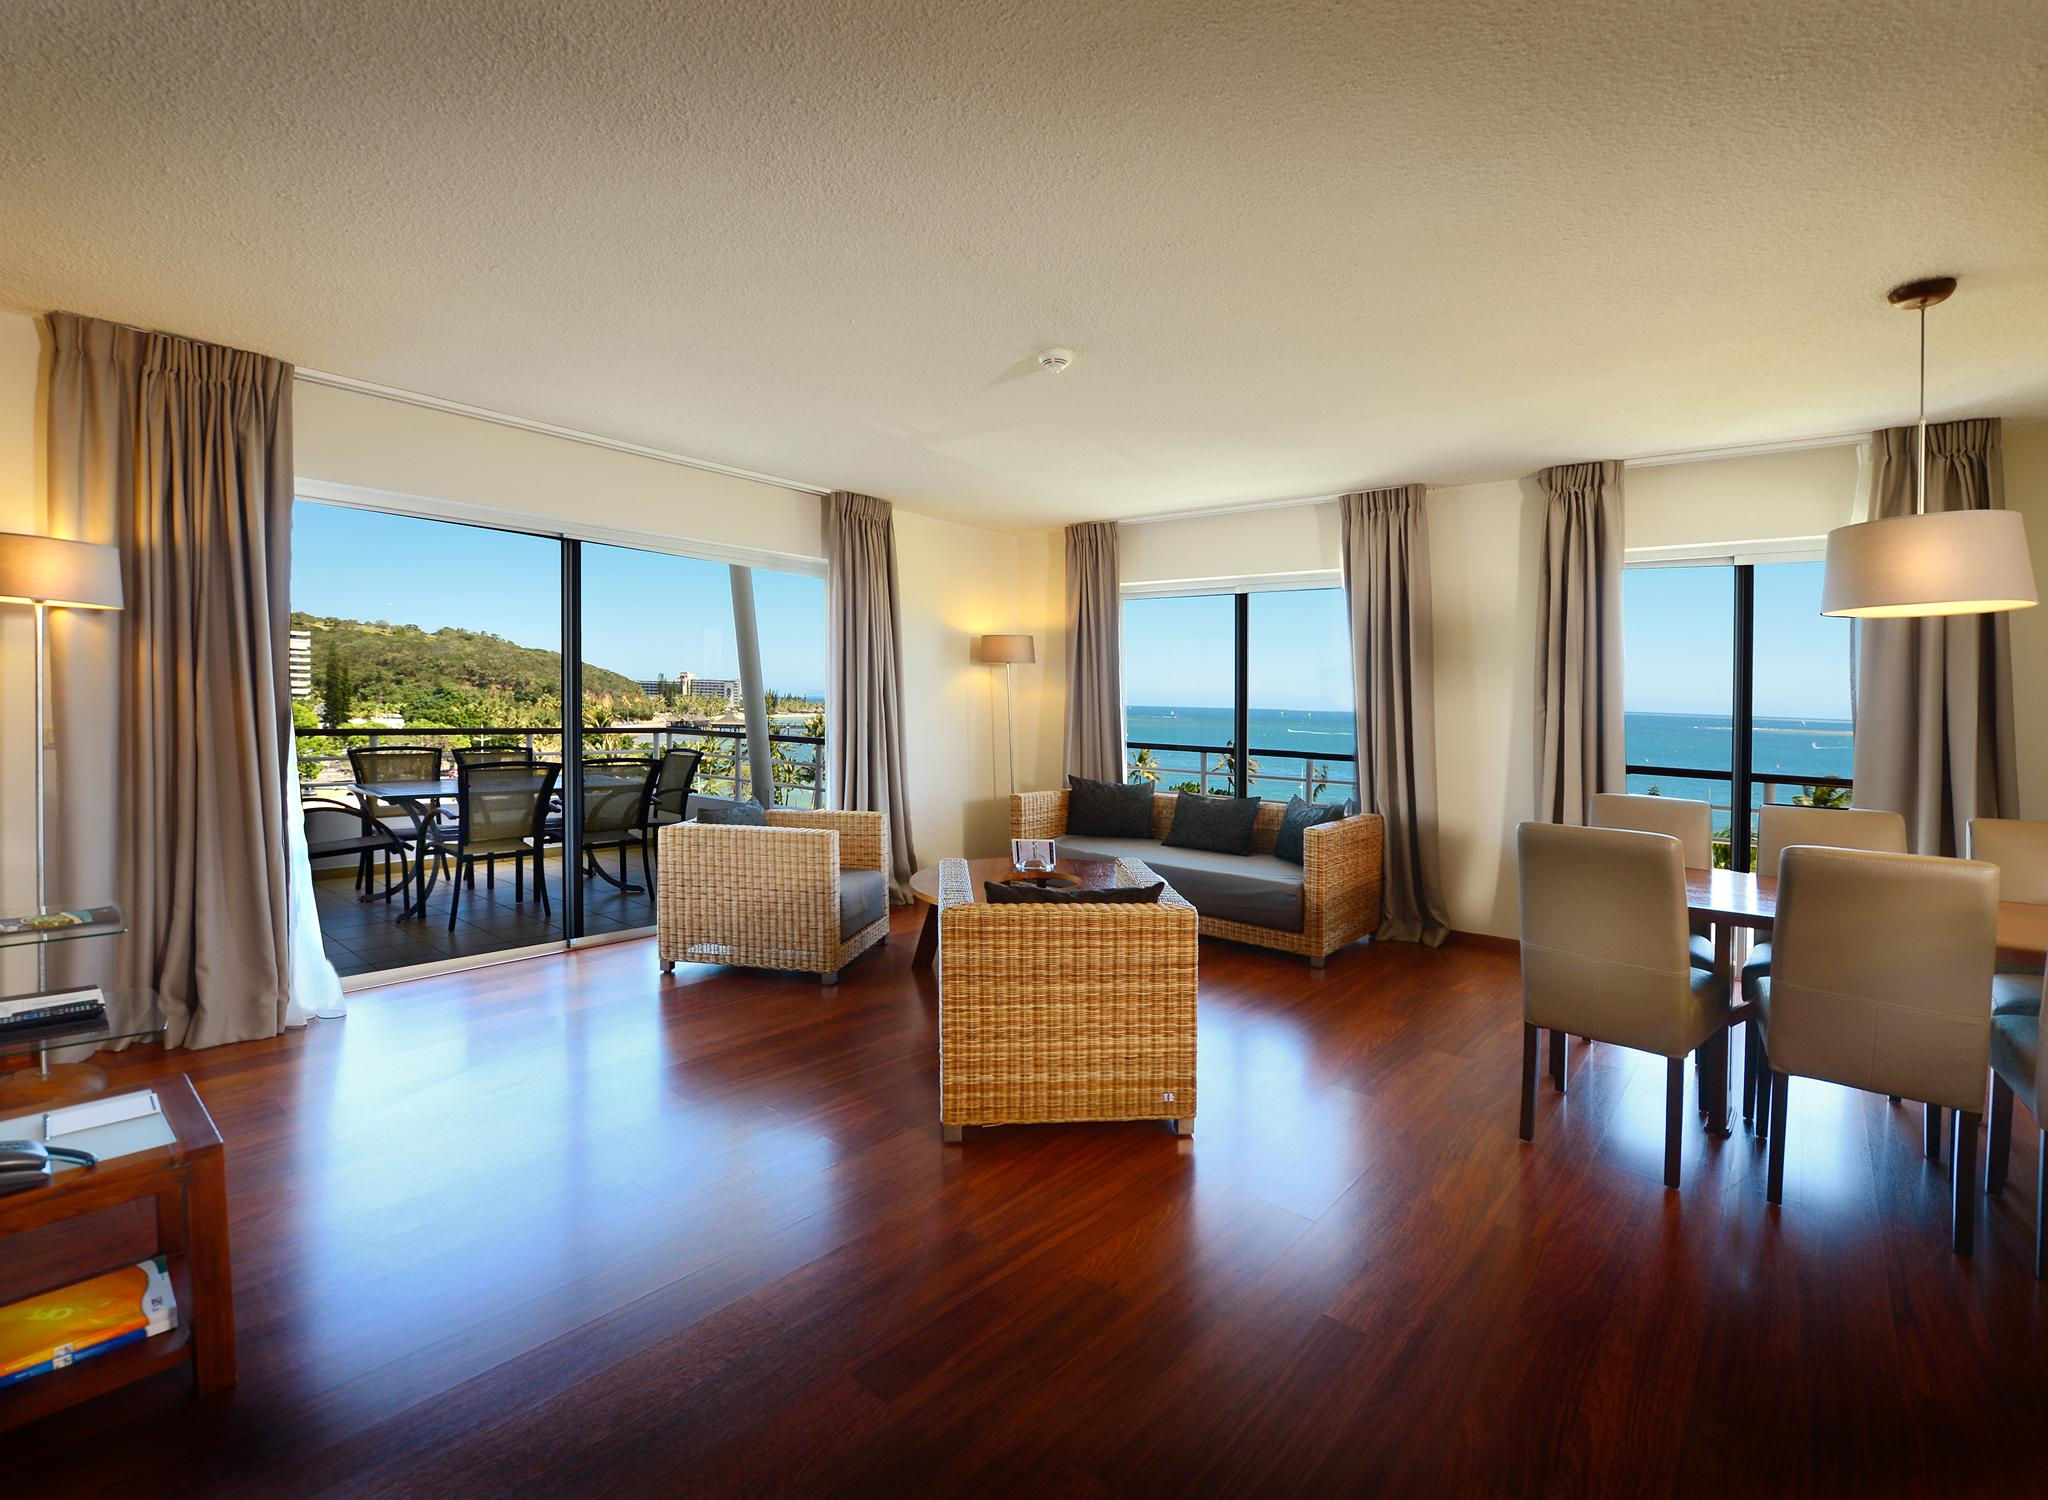 hilton worldwide hotels resorts nouvelle cal donie. Black Bedroom Furniture Sets. Home Design Ideas